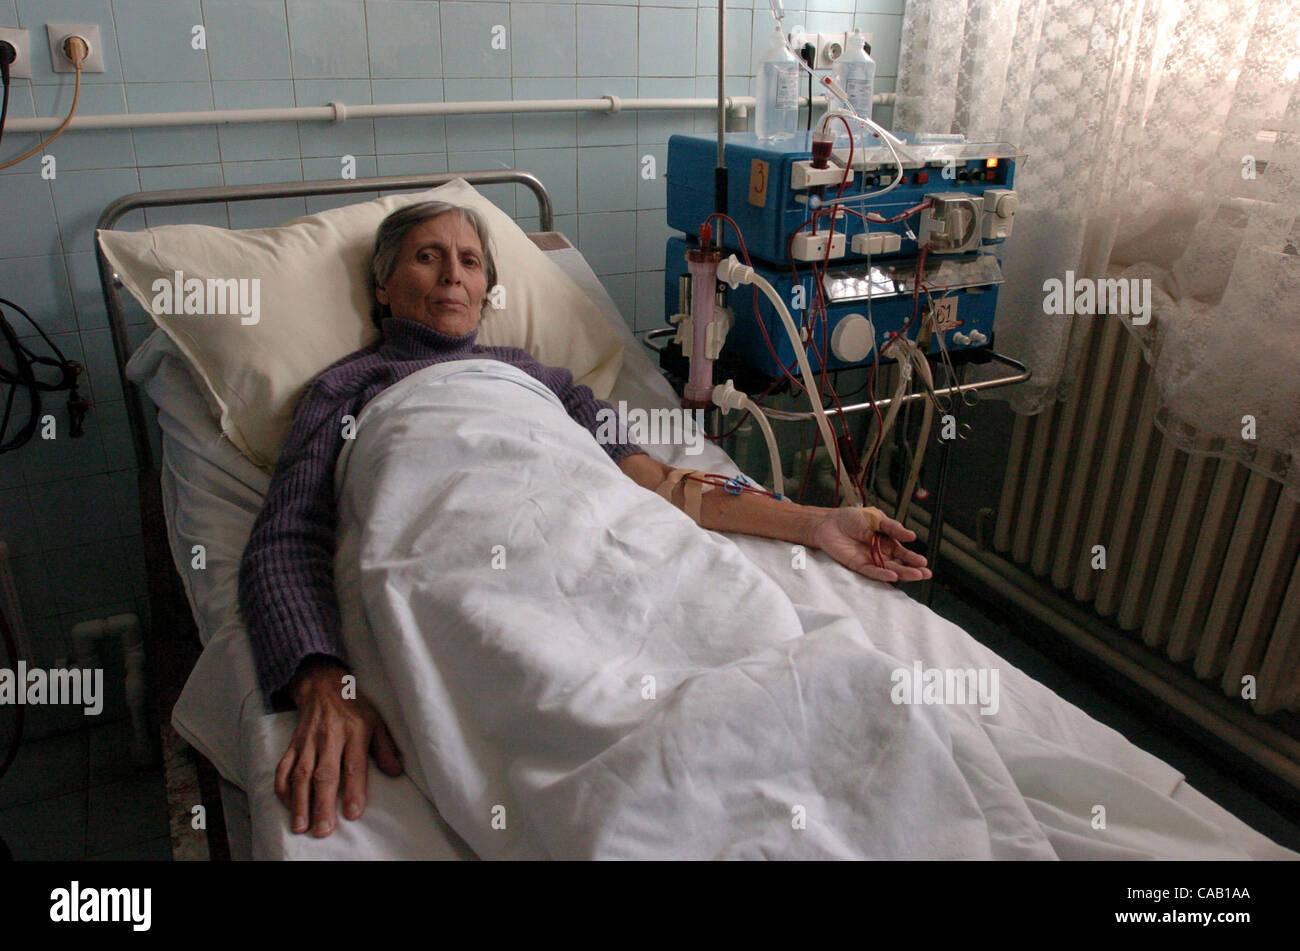 Mar 22, 2004; Kosovo, SERBIA; An elderly Serbian women at the hospital in Kosovska Mitrovica. She was injured during - Stock Image